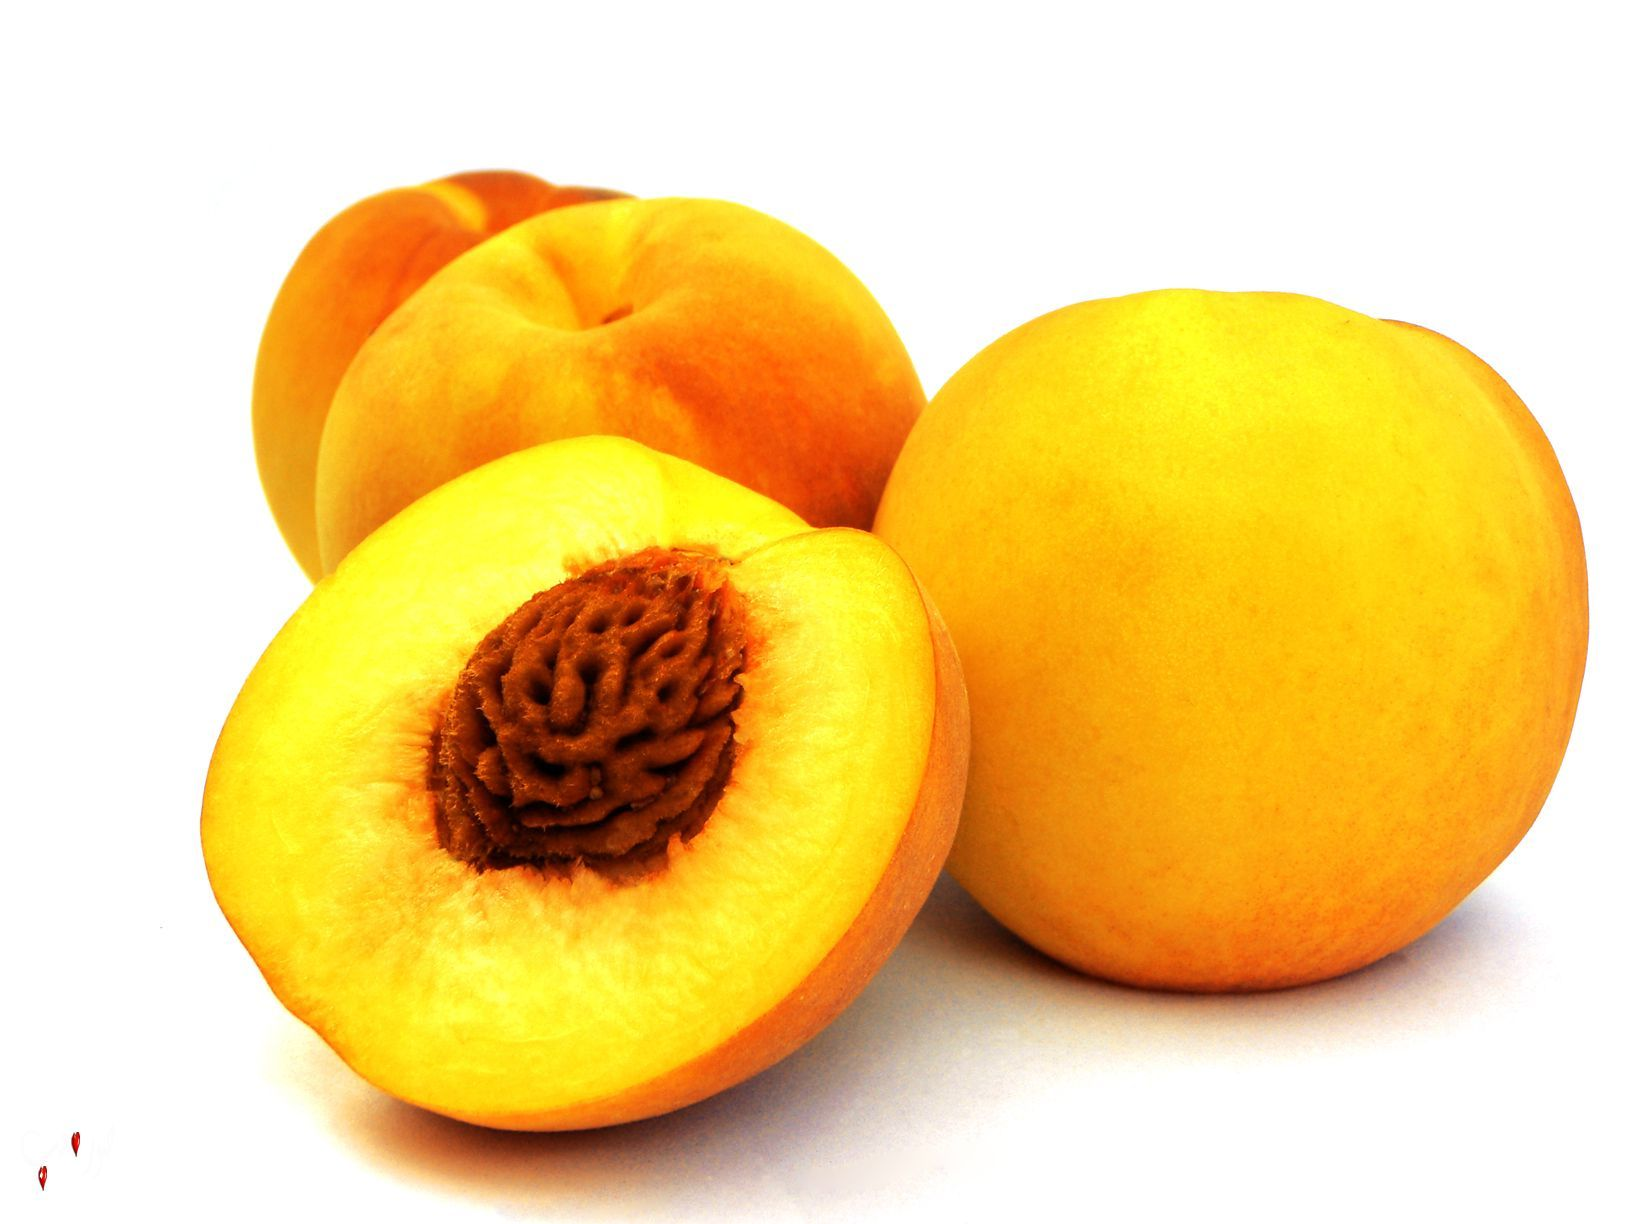 صور خوخ احدث واكبر مجموعة صور الخوخ 2015 صور فواكه Peach Juice Smoothies Recipes Smoothie Recipe Orange Juice Snacks Under 100 Calories